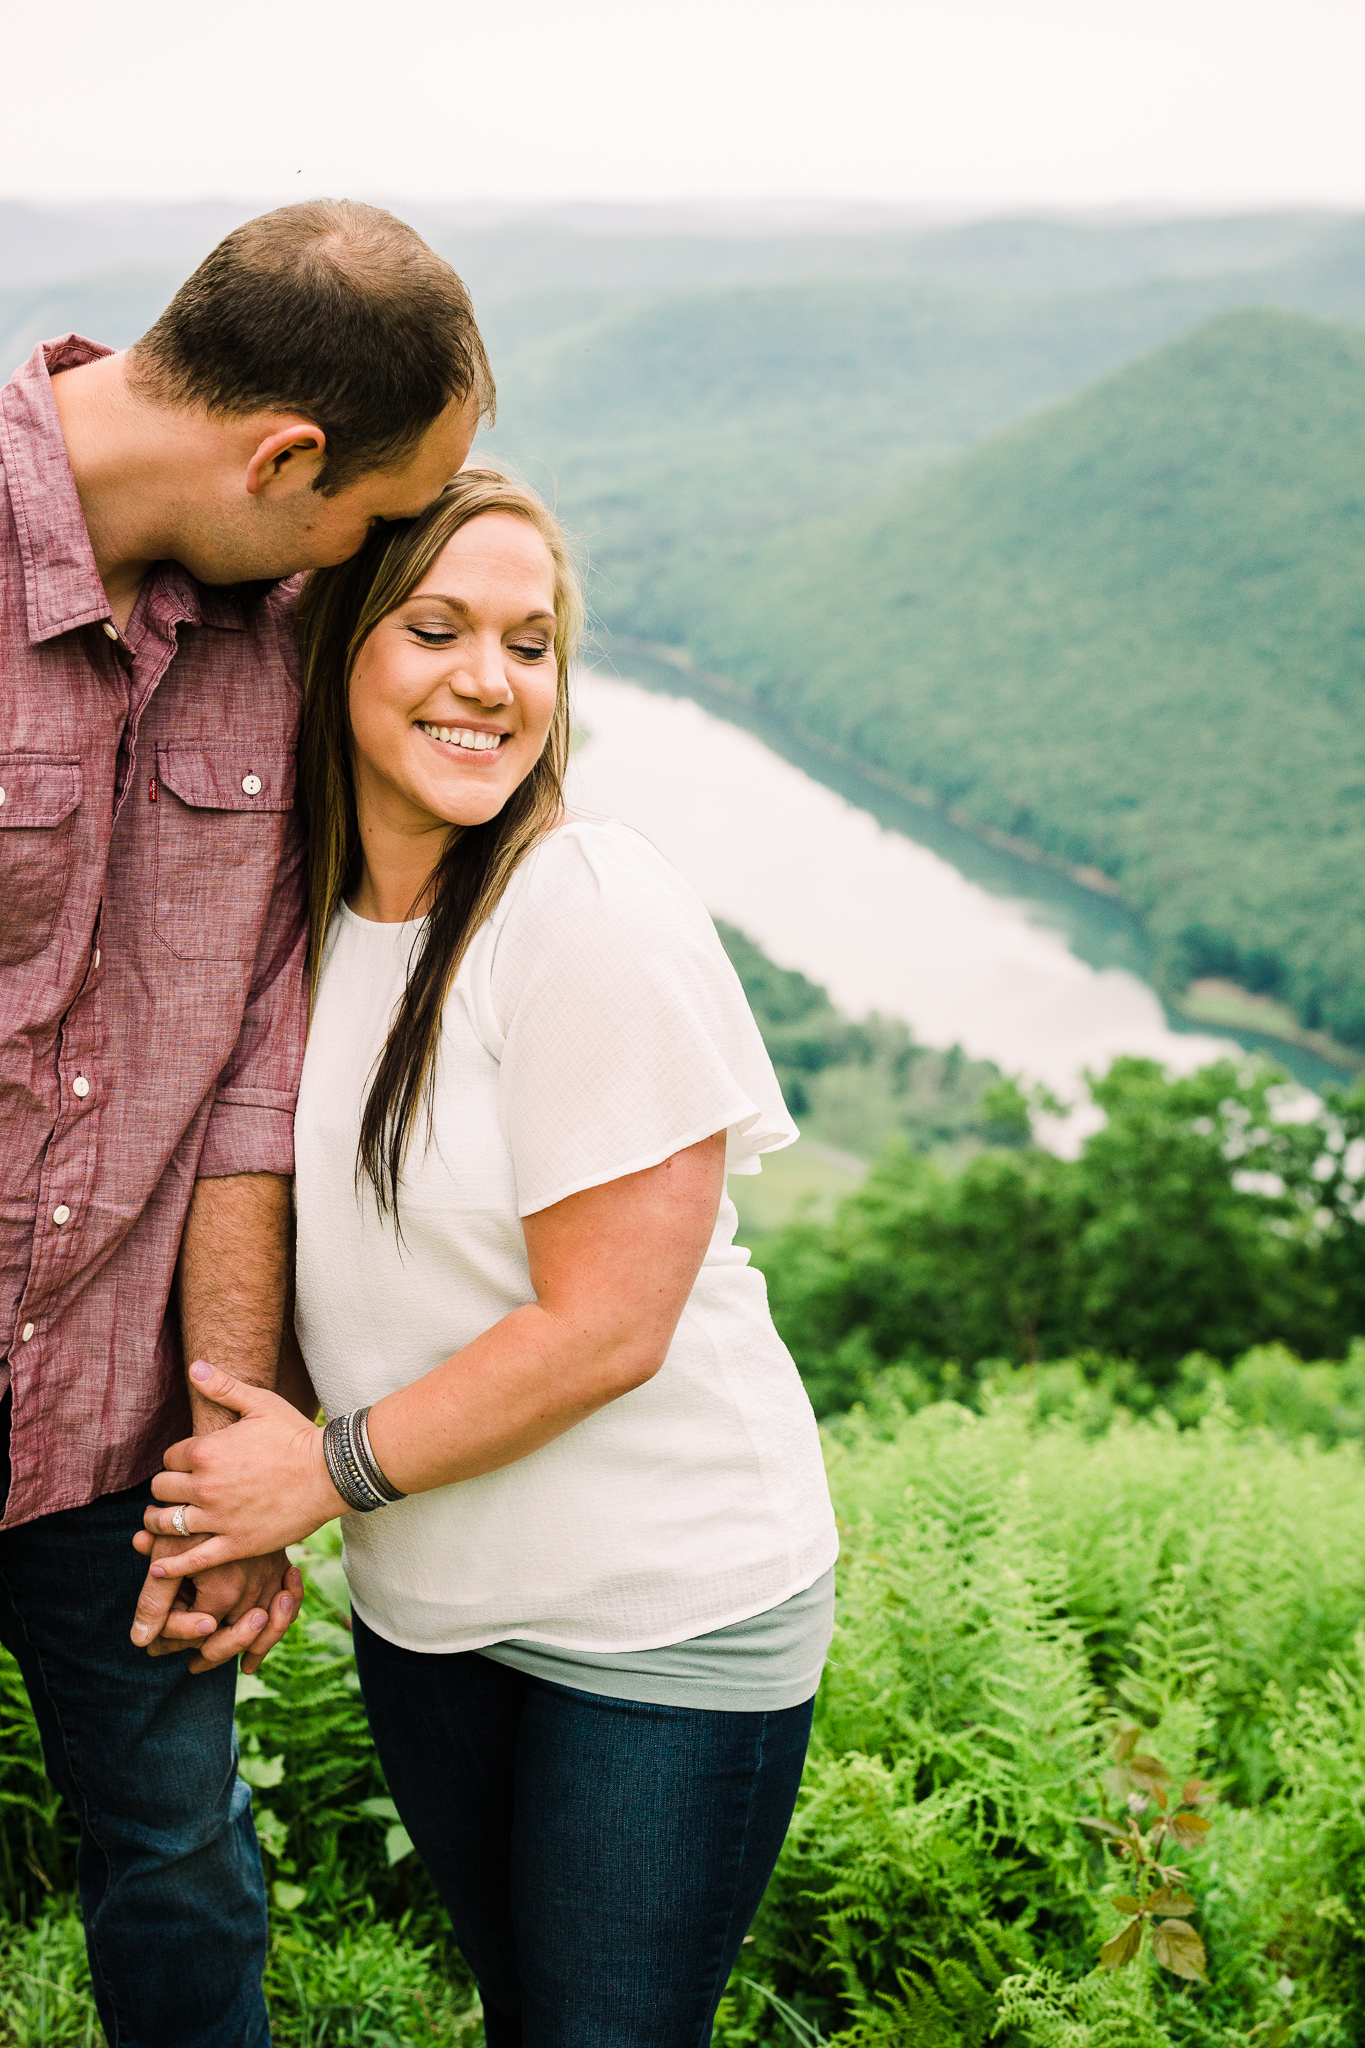 Kettle-creek-state-park-engagement-9276.jpg